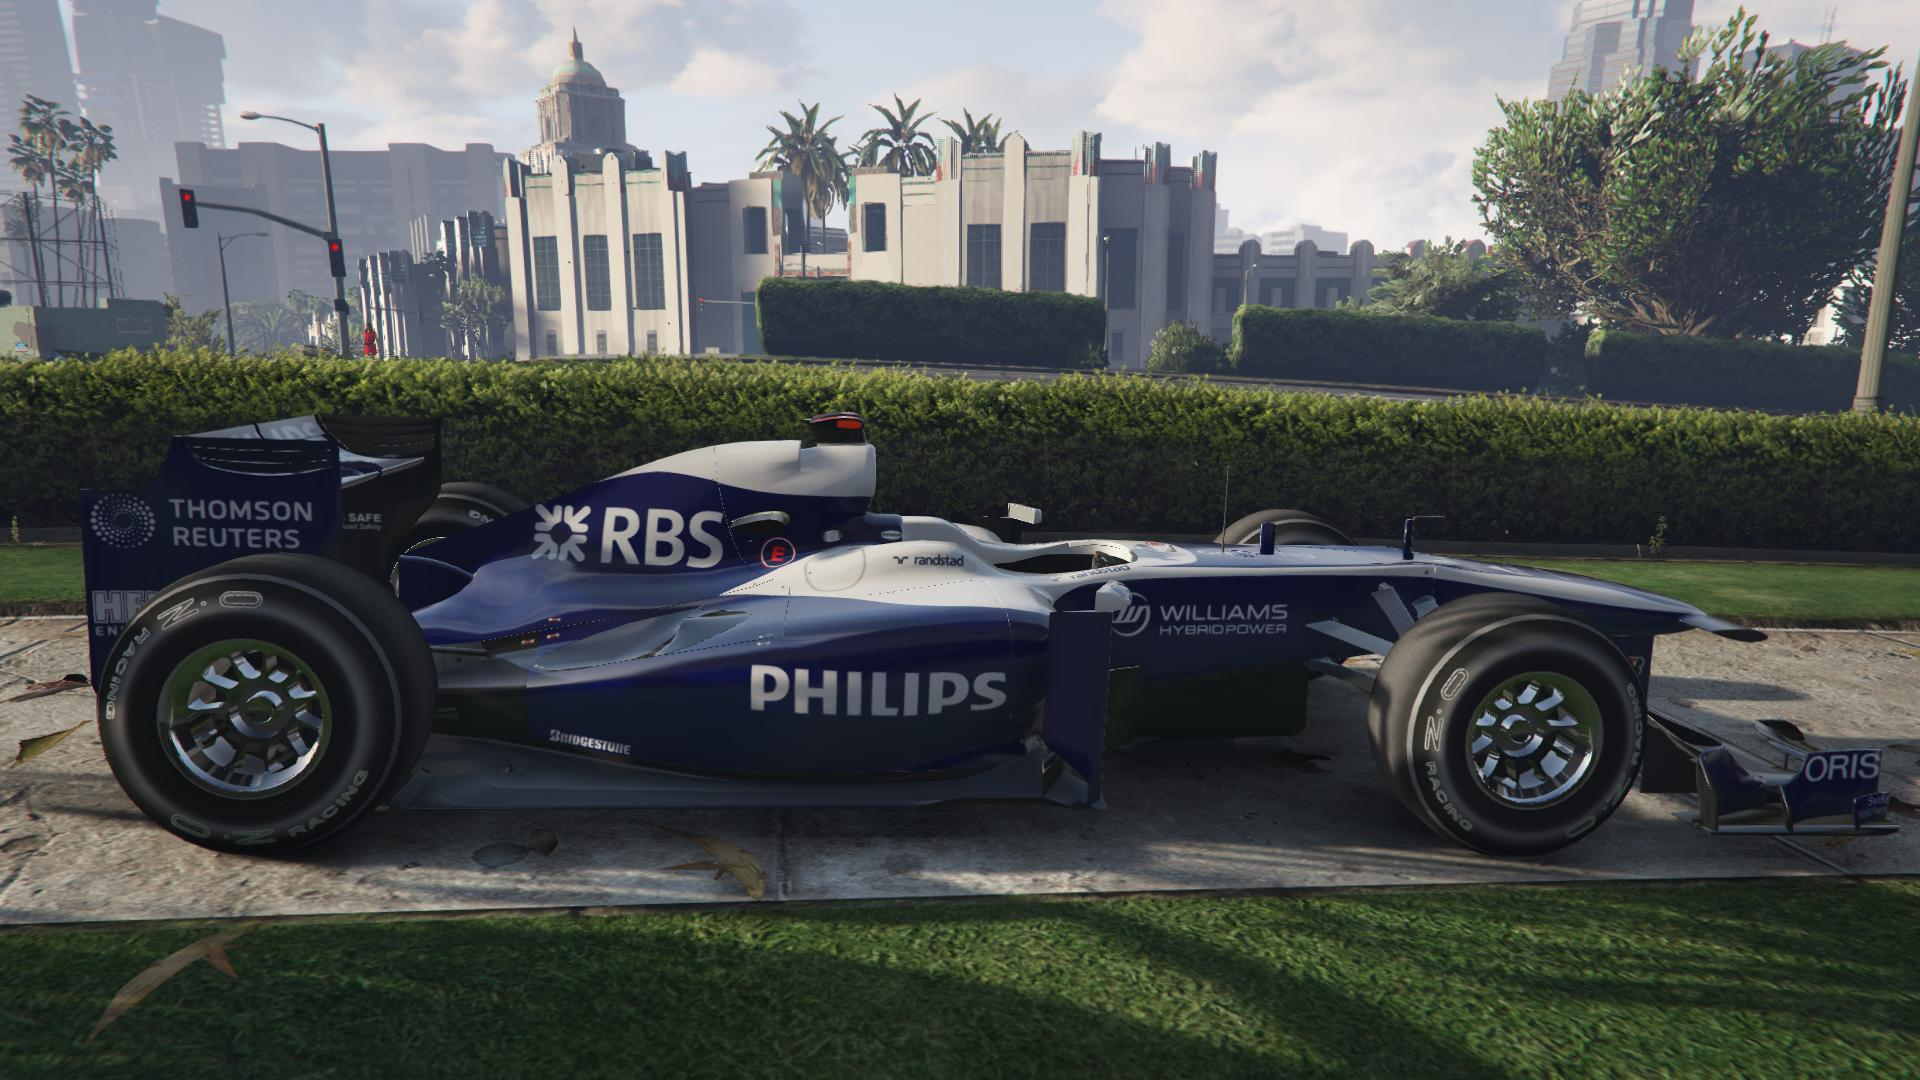 Williams F1 для GTA V - Скриншот 2